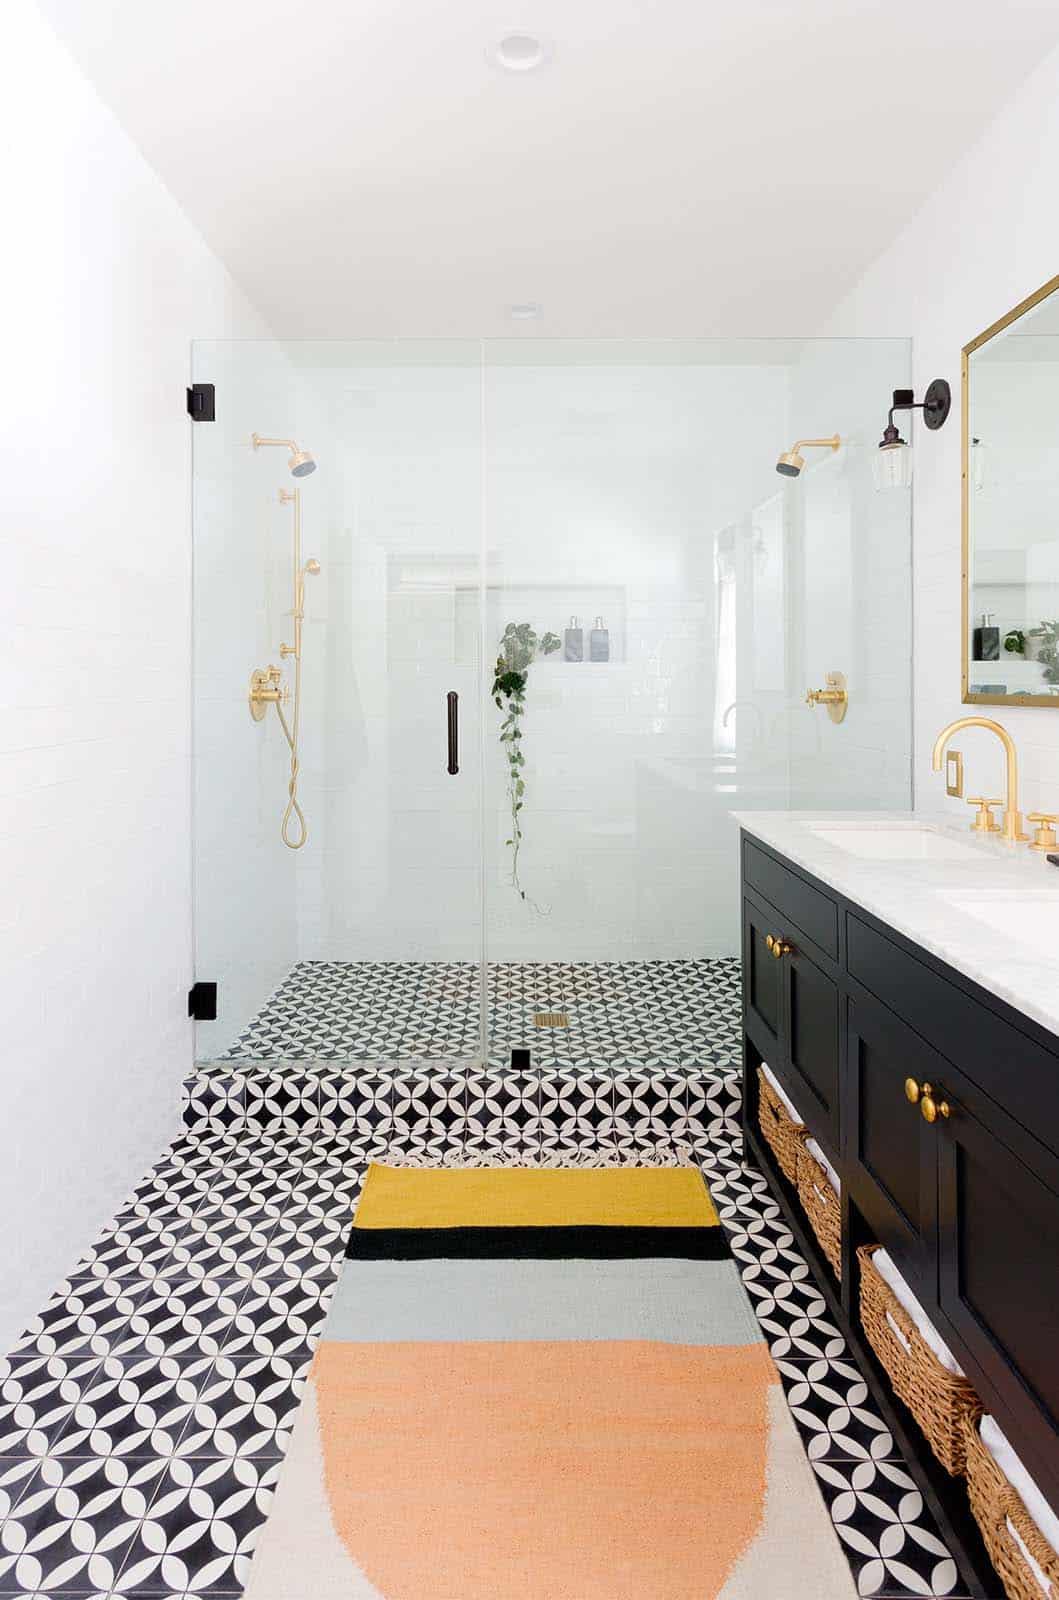 Style espagnol Home-Jette Creative-14-1 Kindesign